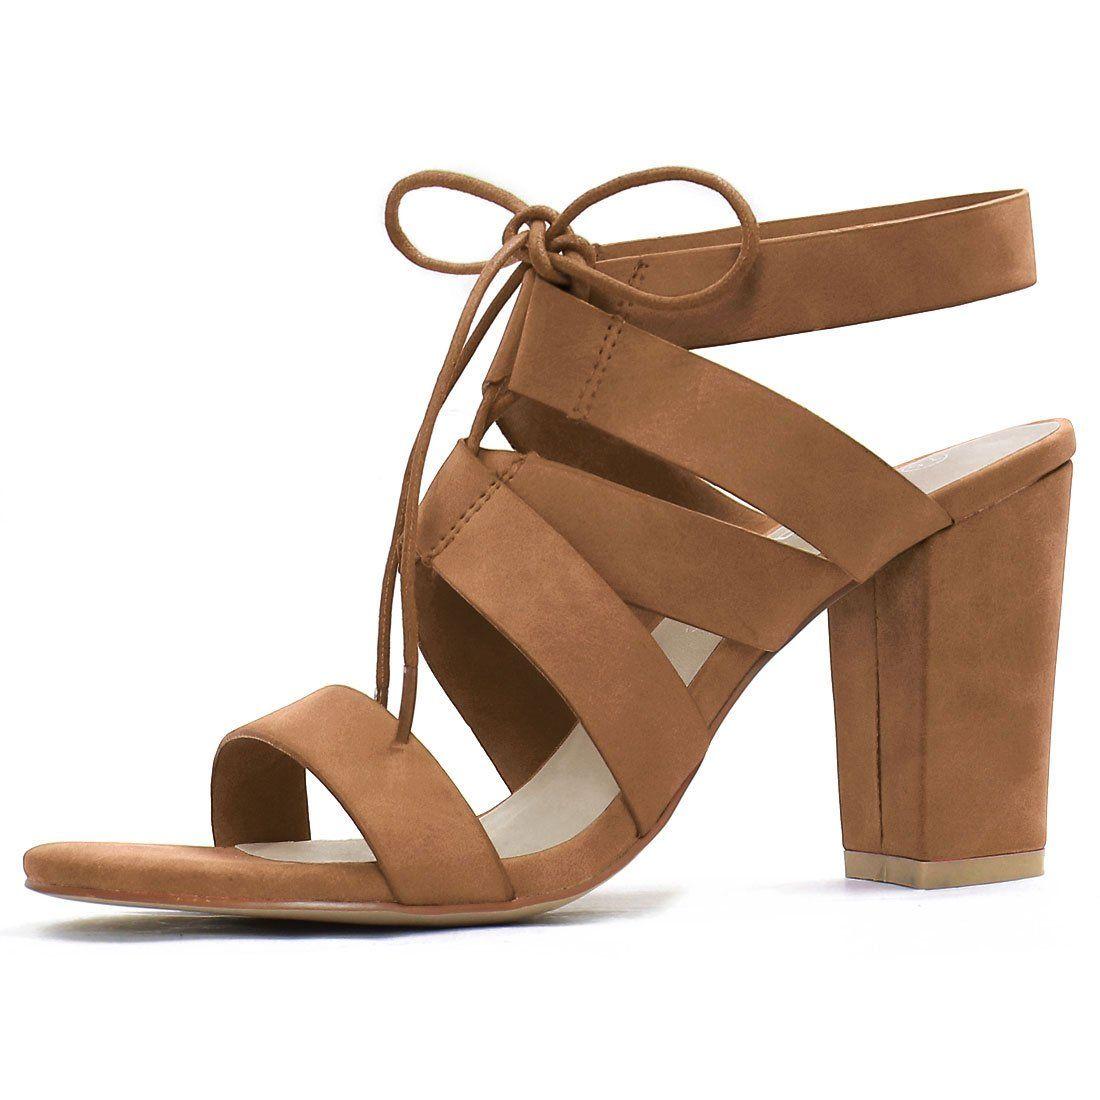 Women Open Toe Cutout Chunky Heel Lace-Up Sandals Light Beige US 7.5